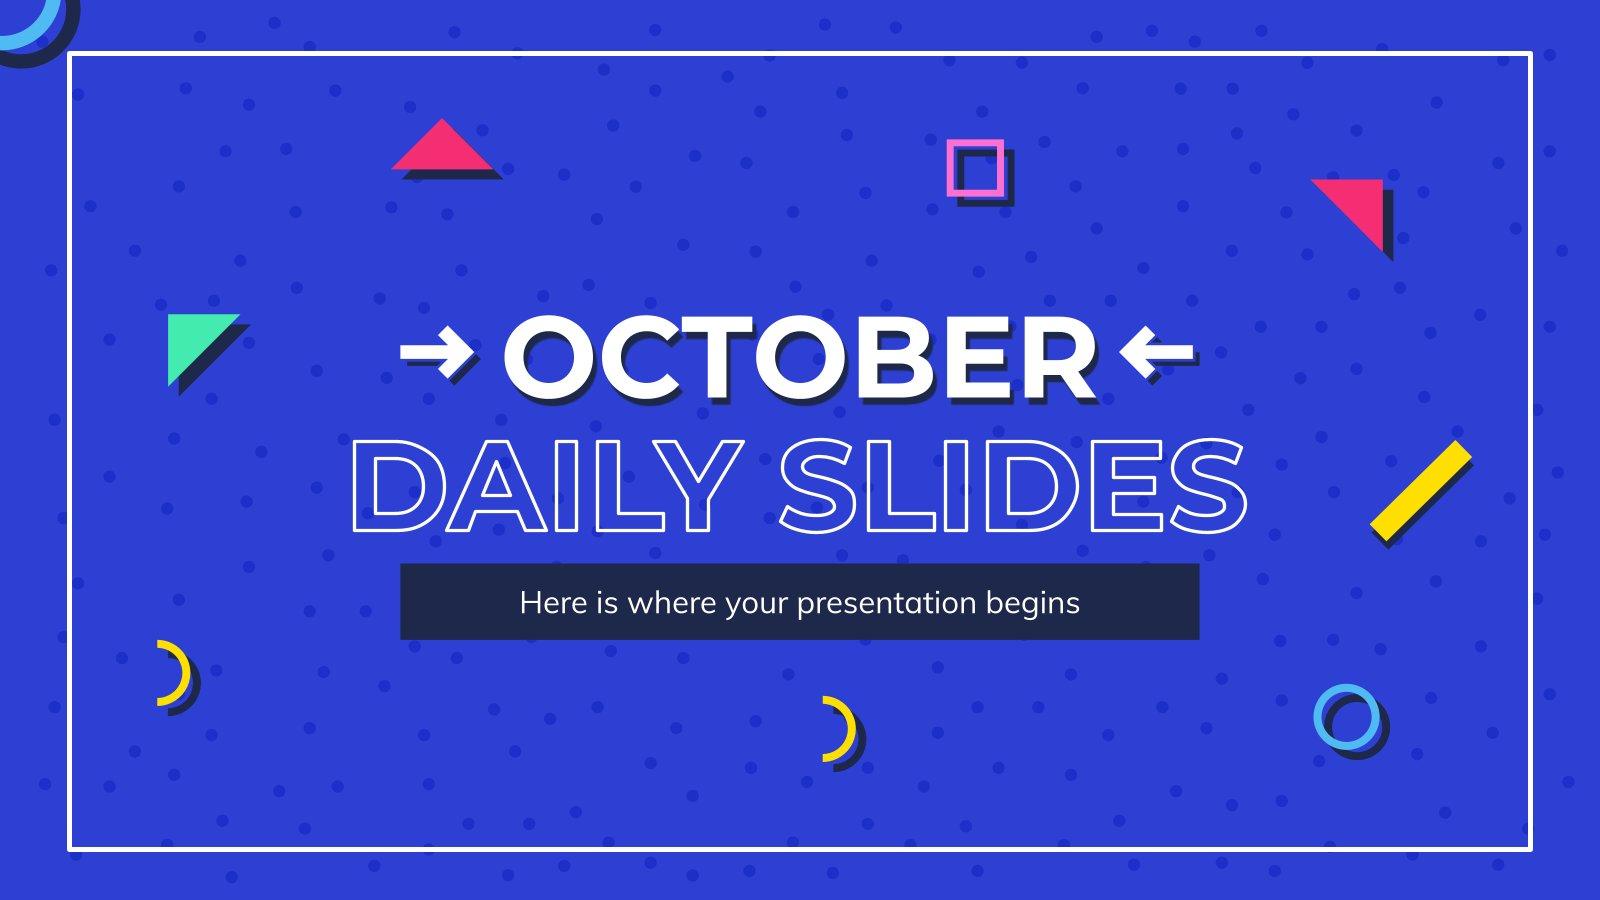 October Daily Slides presentation template